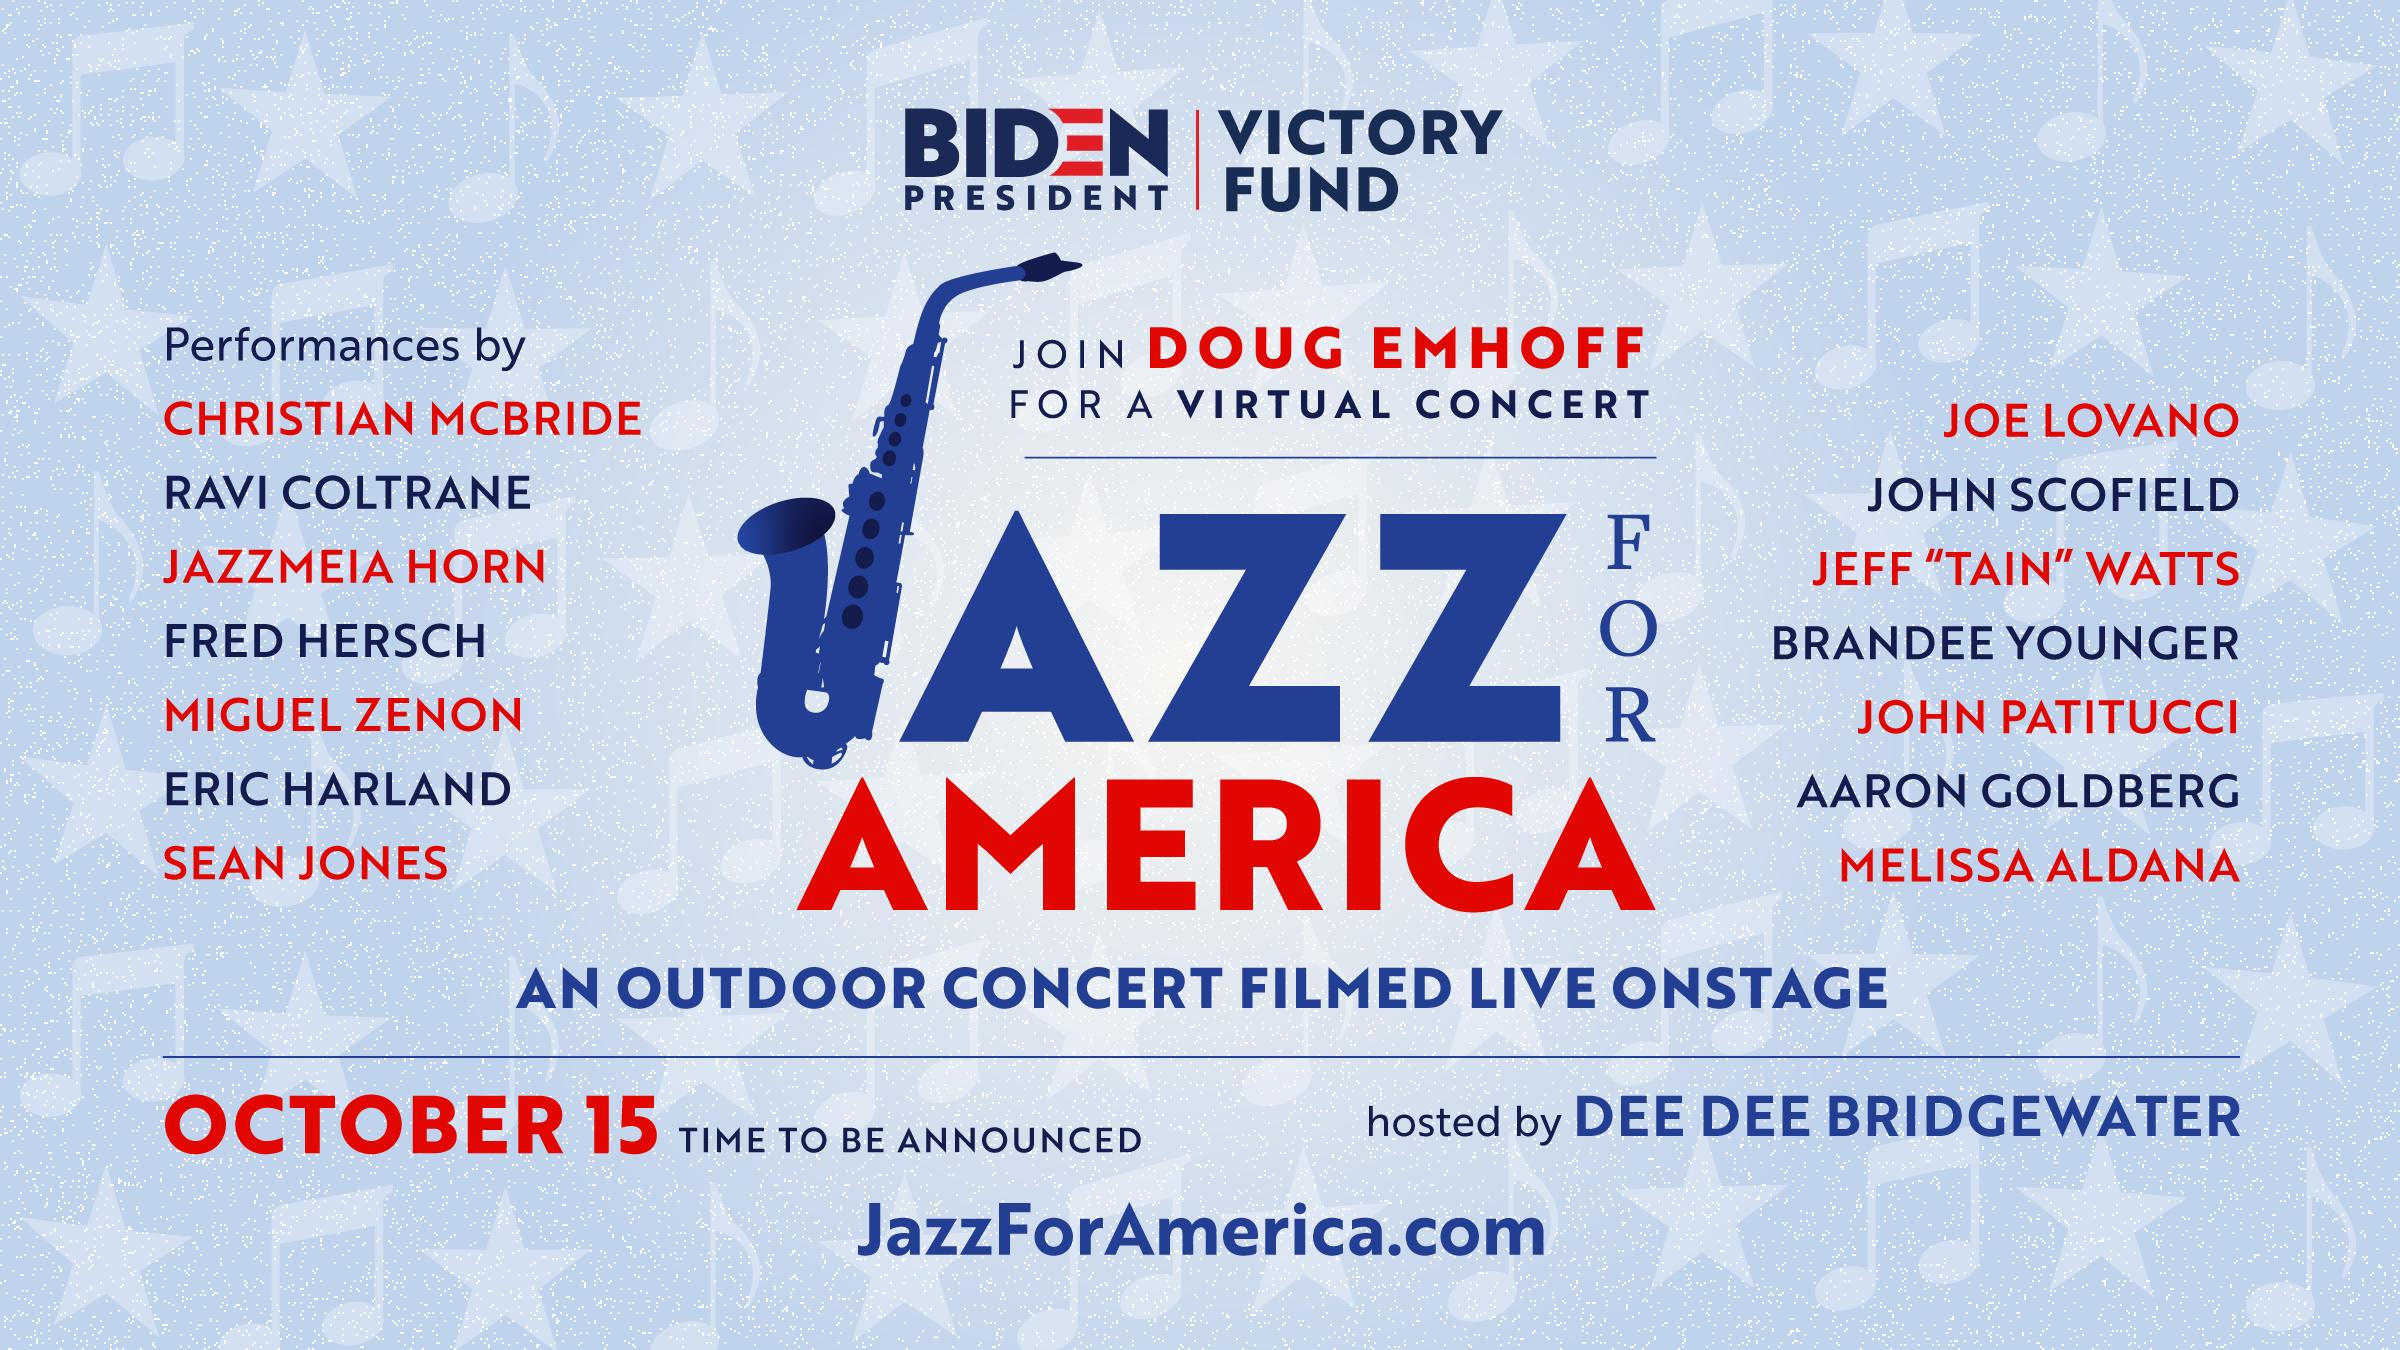 """JAZZ FOR AMERICA"" TO SUPPORT BIDEN/HARRIS 2020"